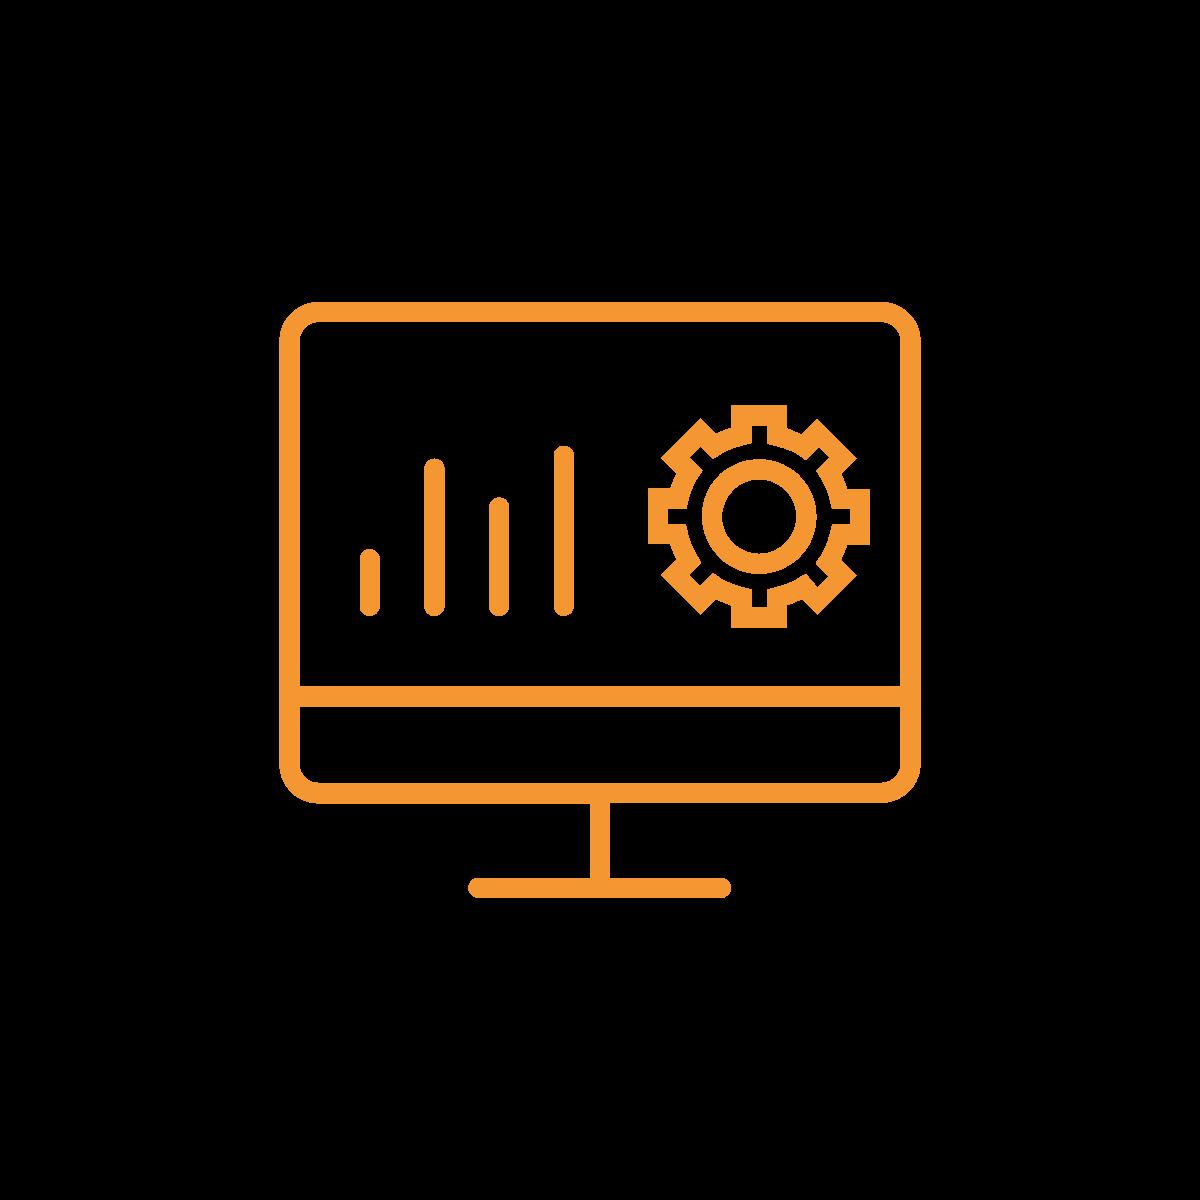 icon-search-engine-optimization